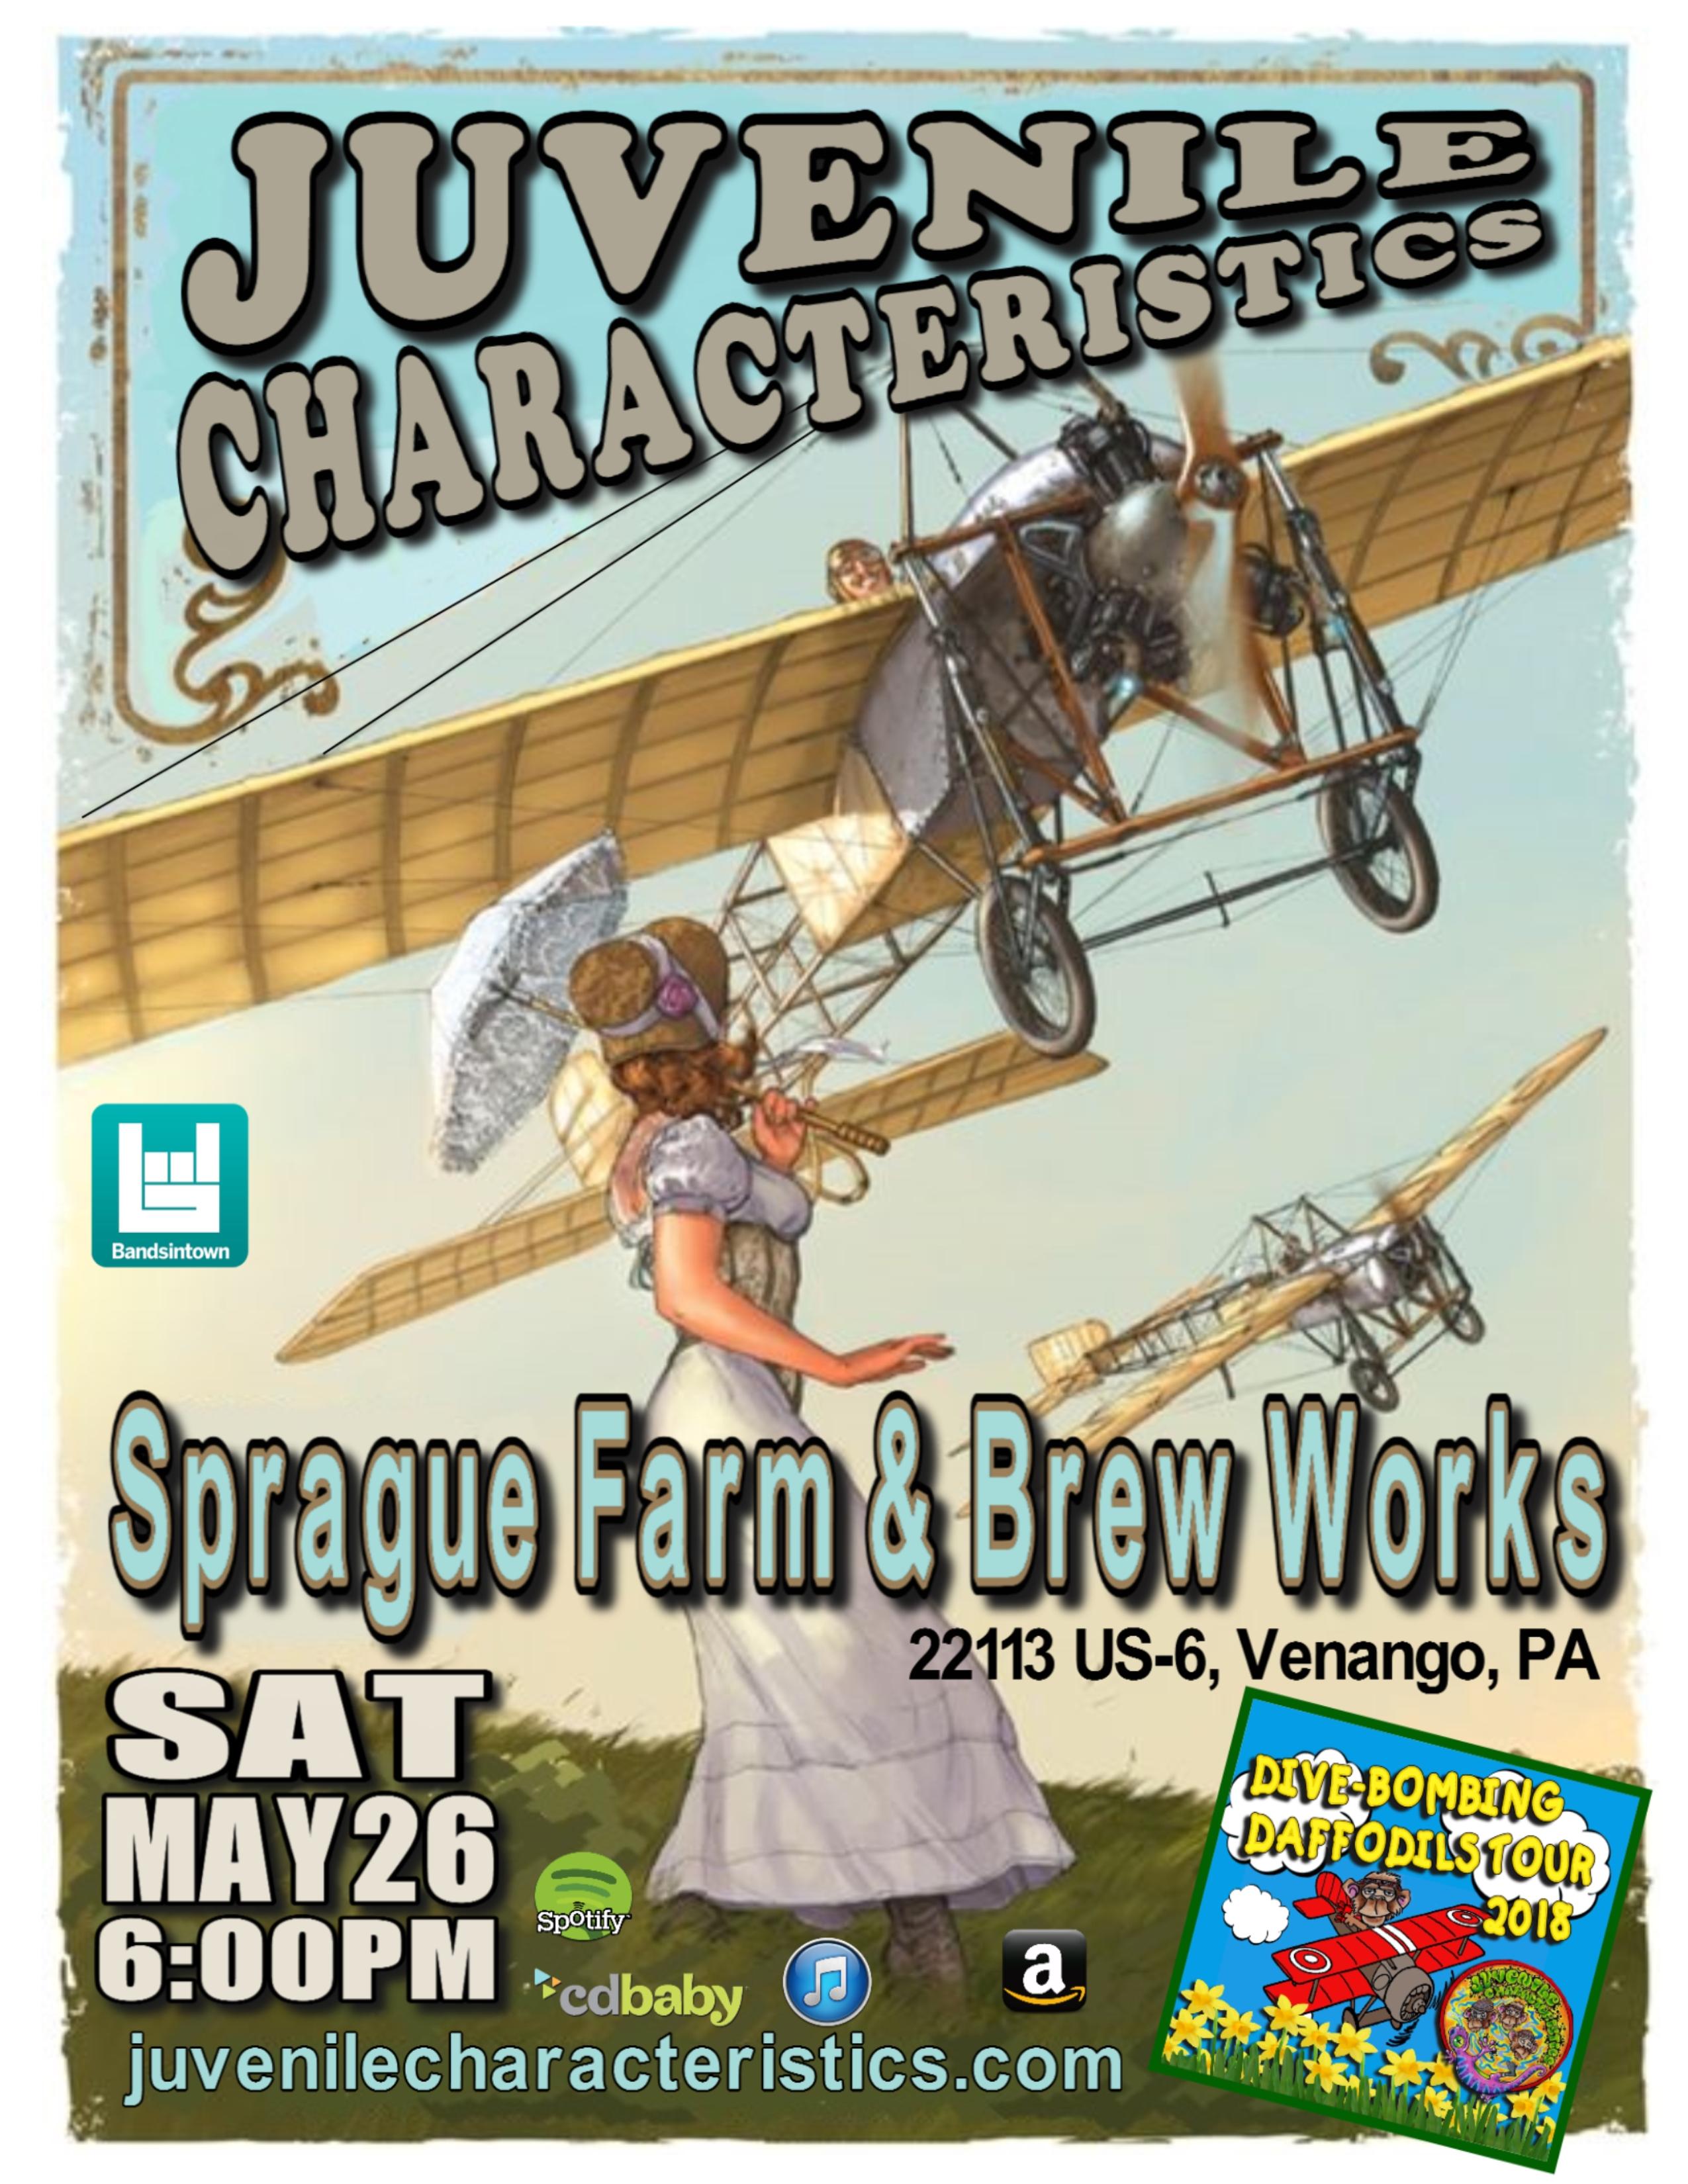 5-26-18 Sprague Farm